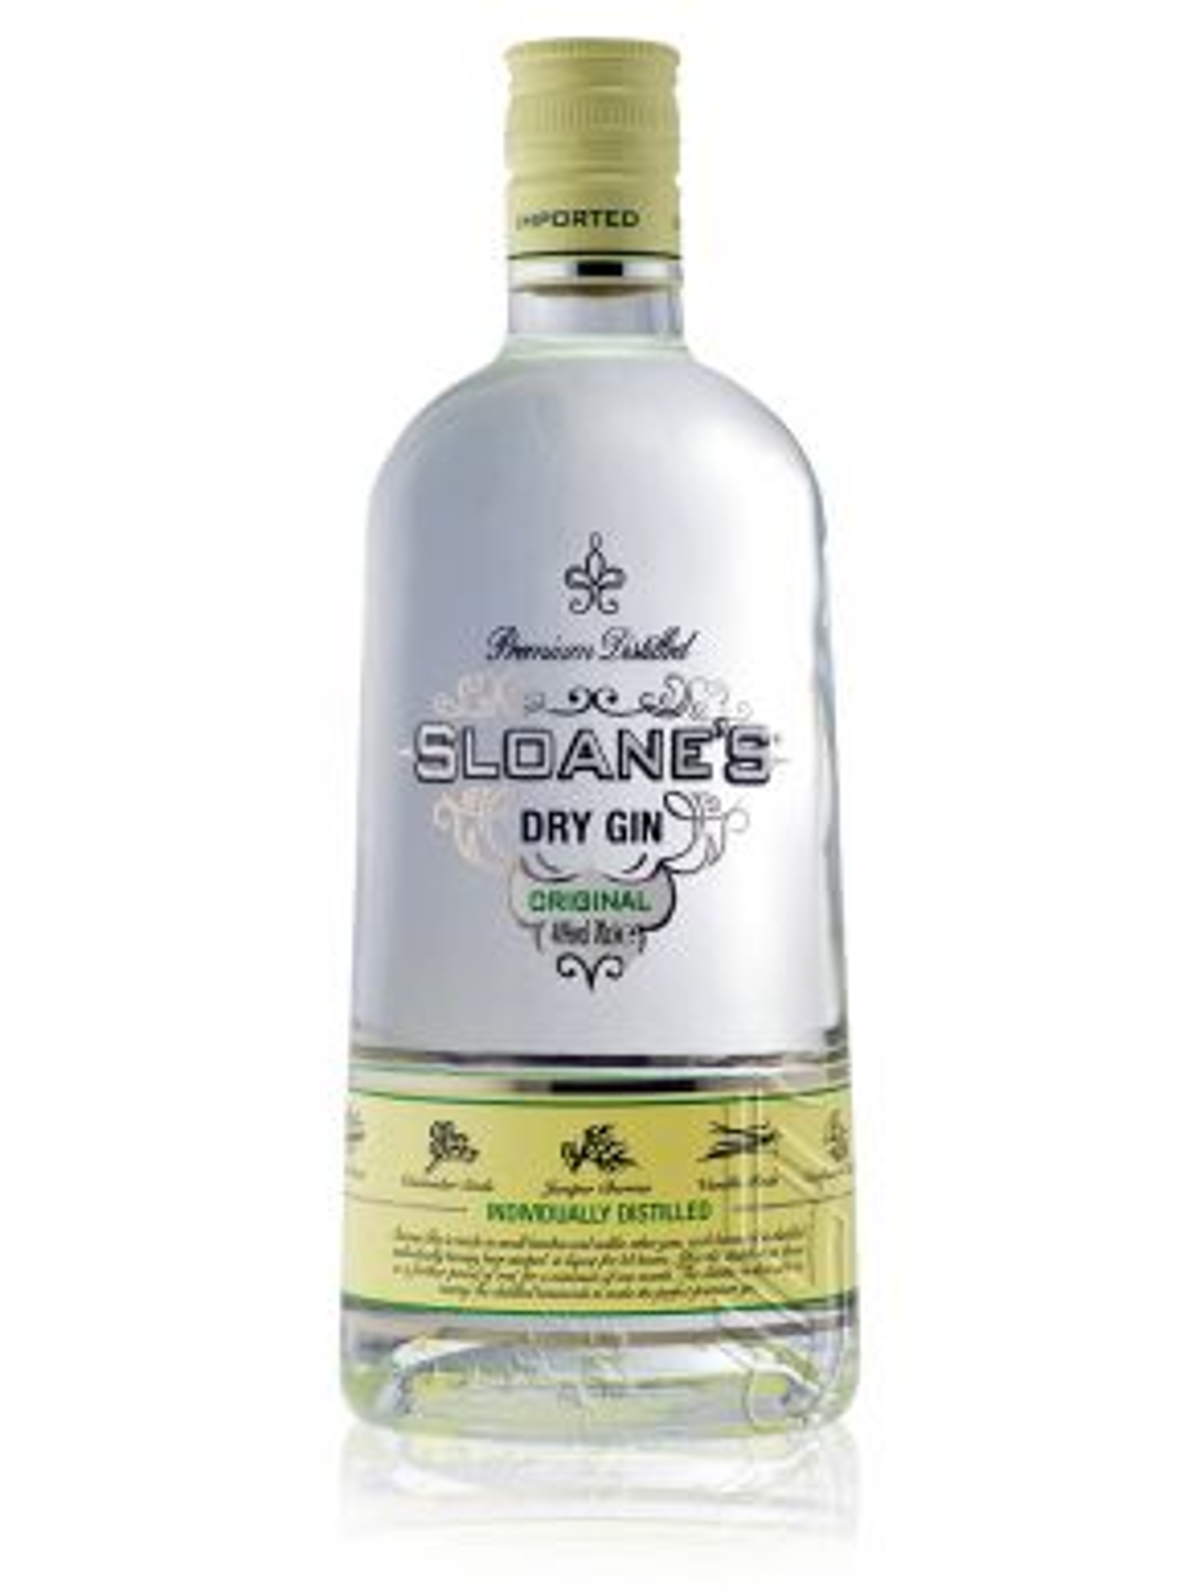 Sloanes Premium Dry Distilled Gin Original 70cl